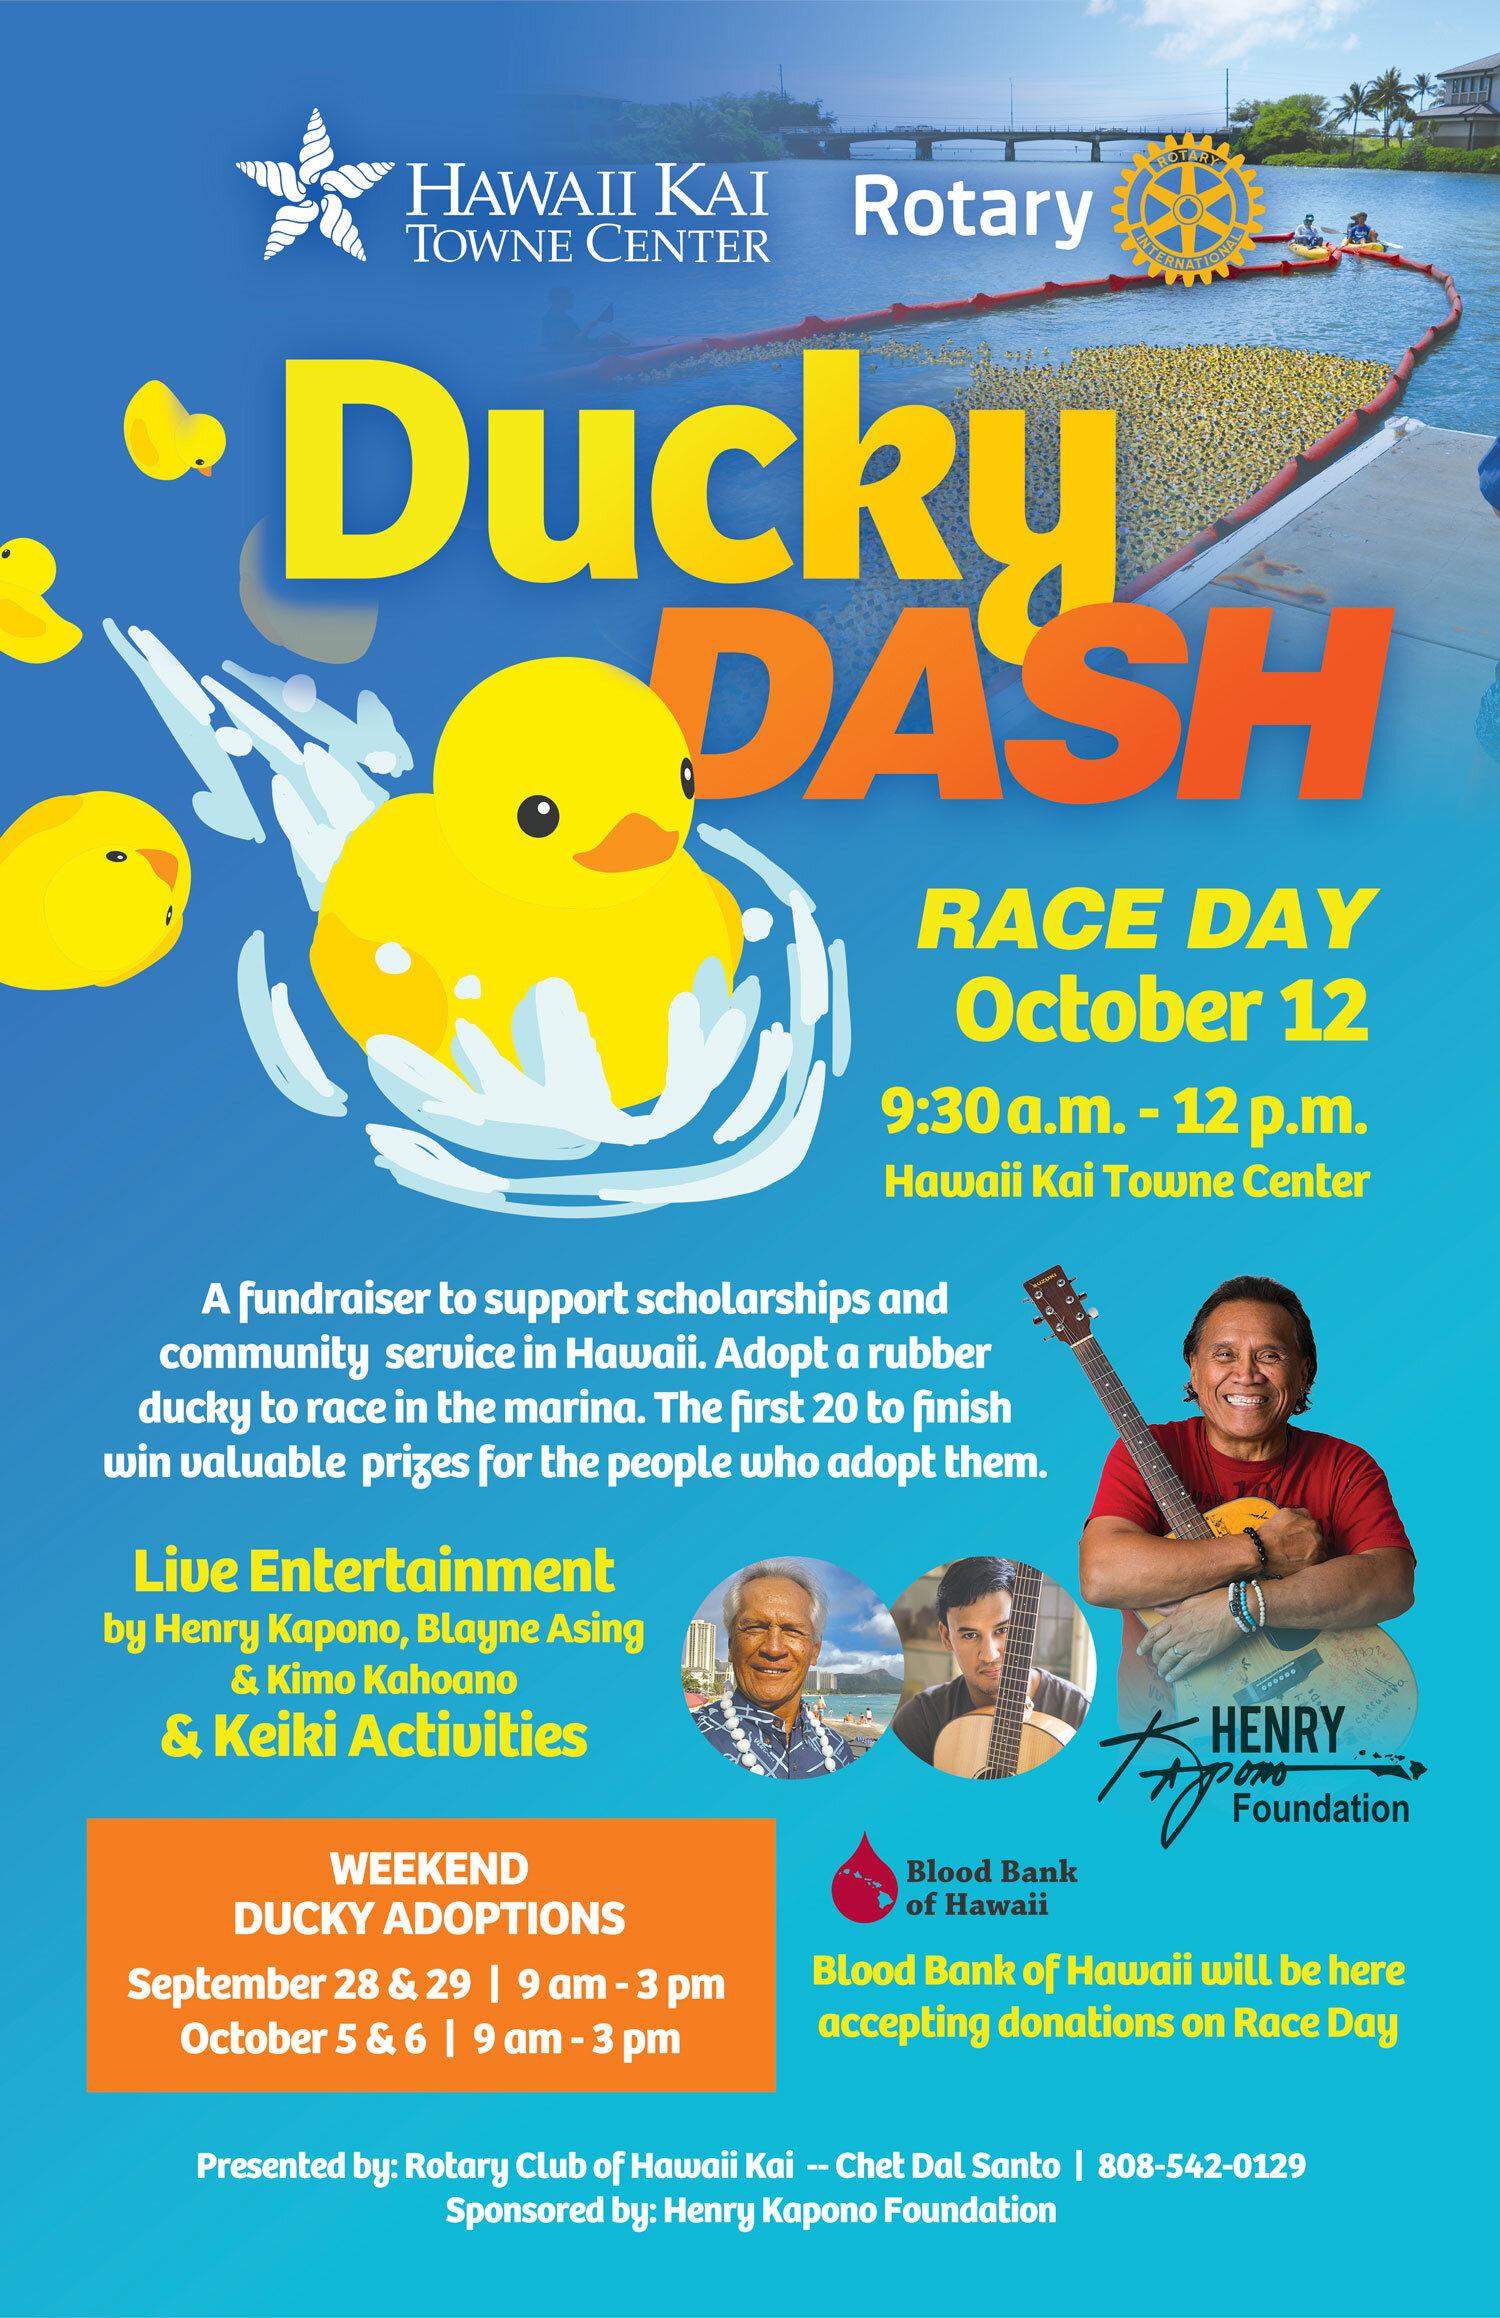 Ducky-Dash-2019-11x17.jpg